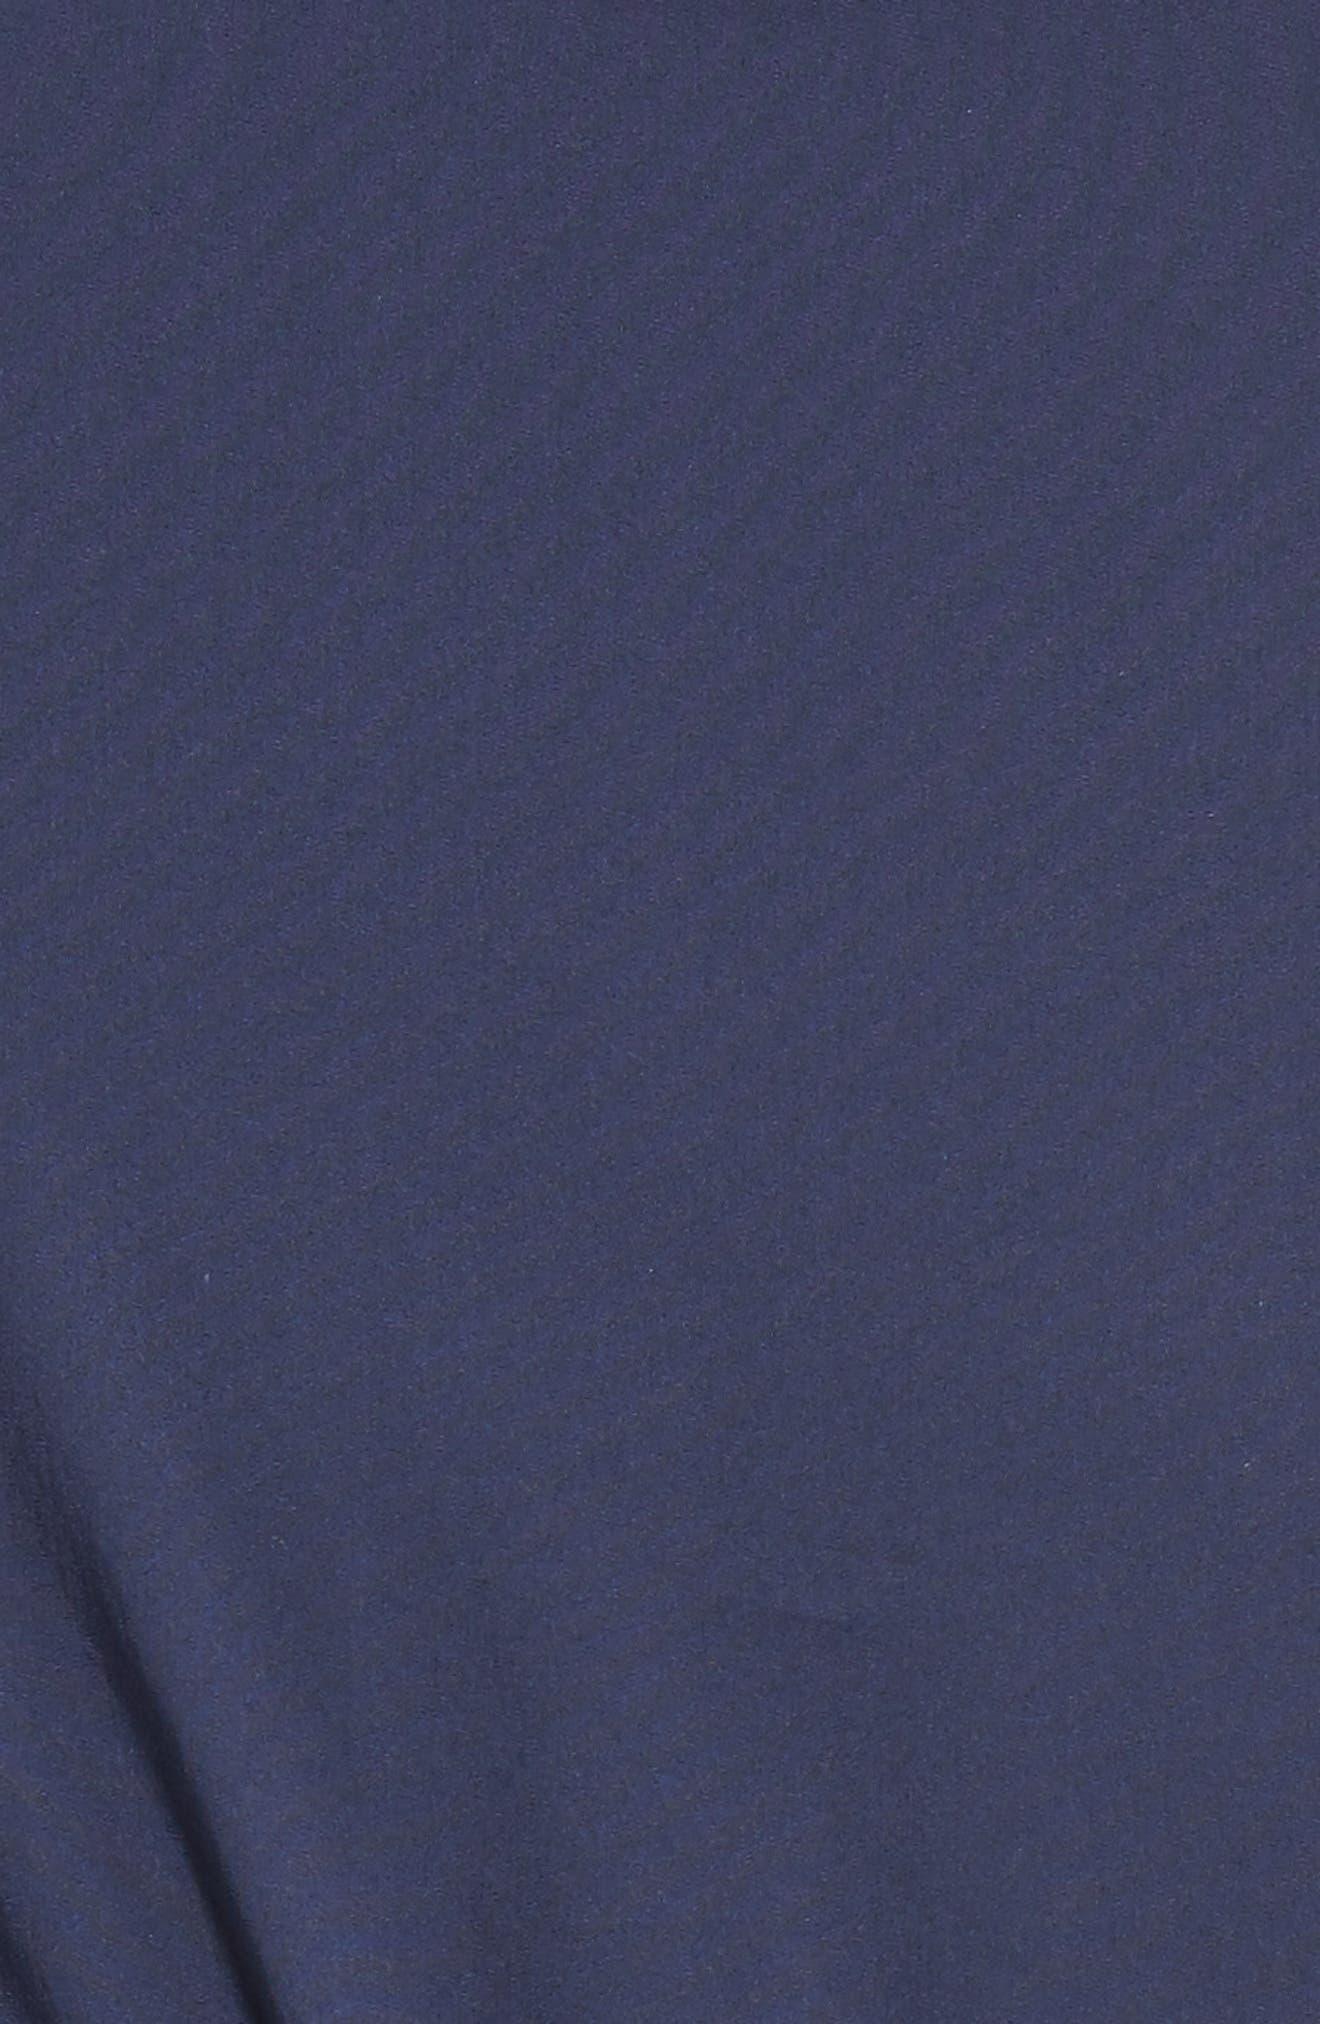 Pintuck Blouson Sleeve Wrap Top,                             Alternate thumbnail 5, color,                             410